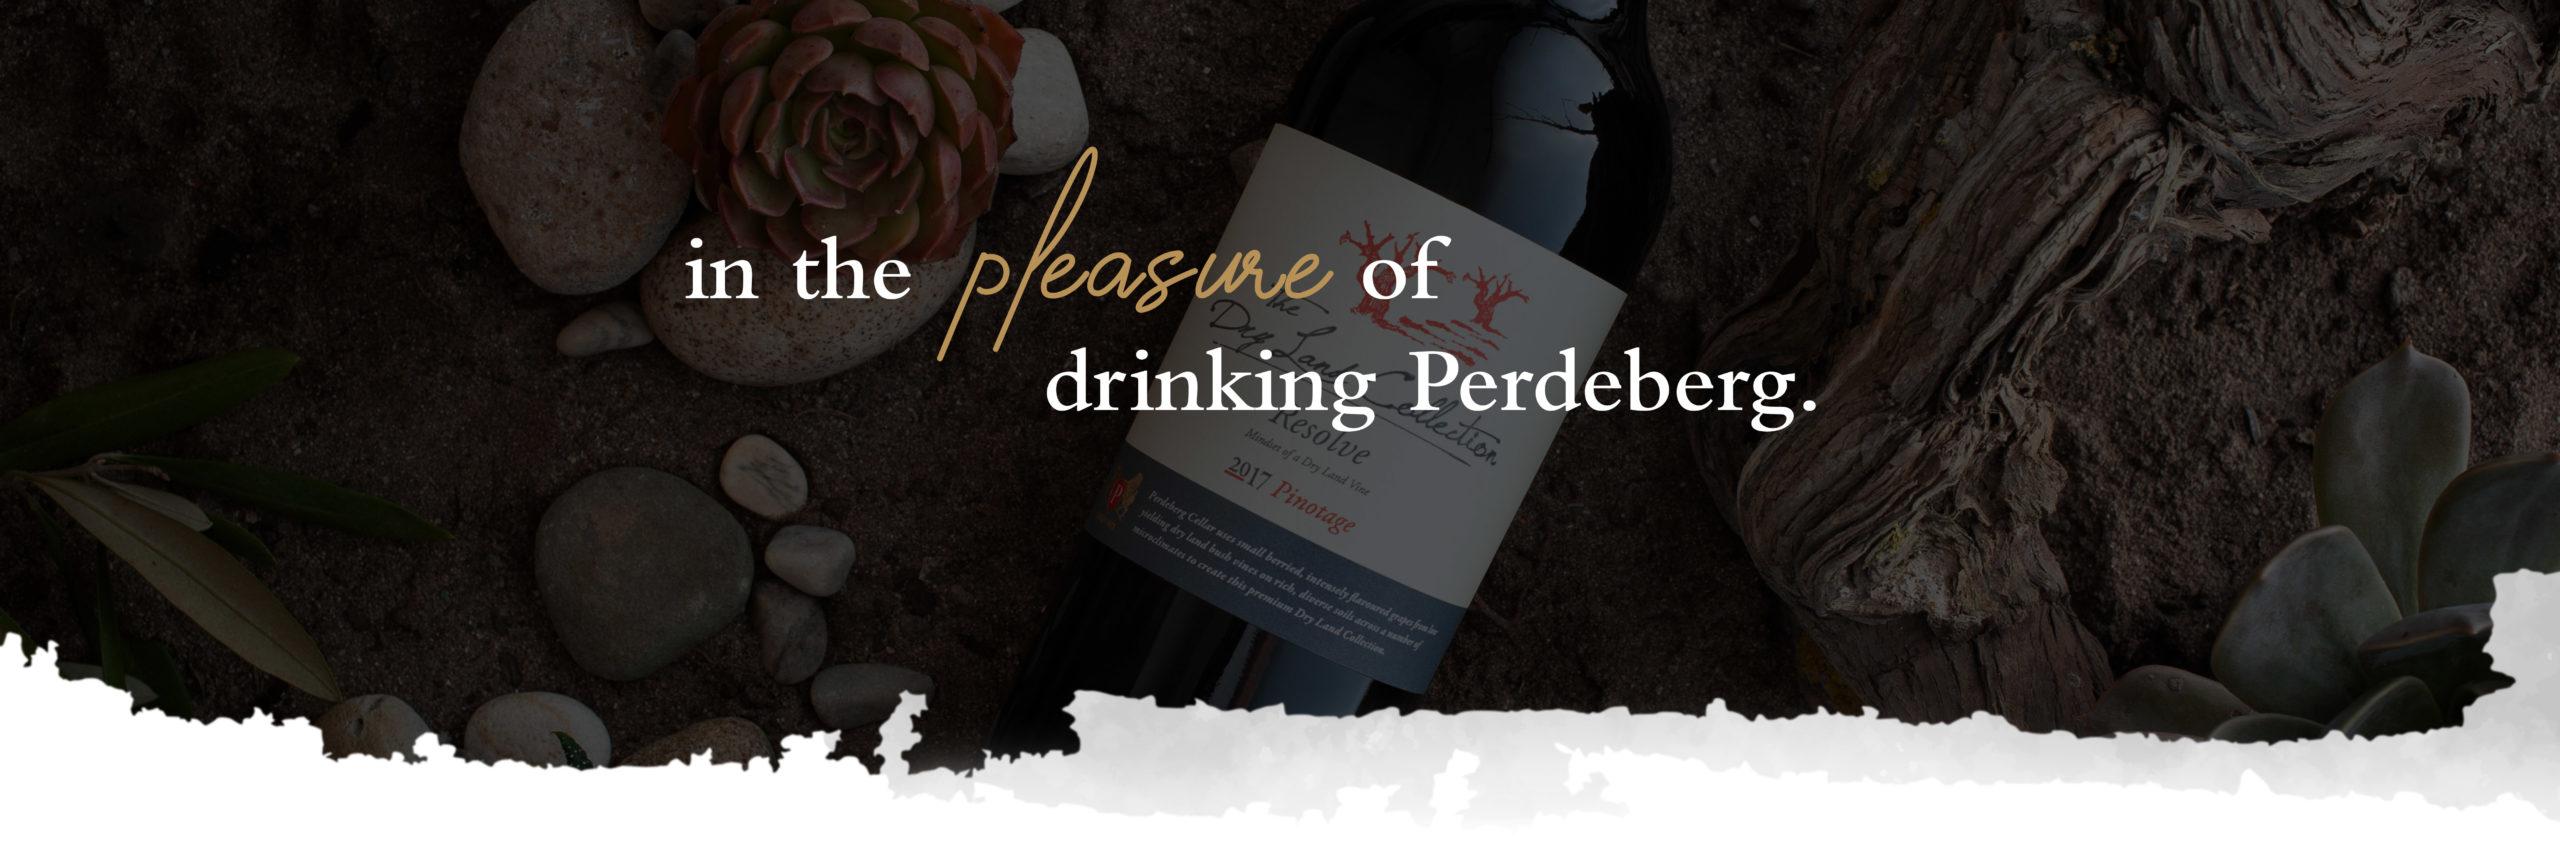 Perdeberg_landing new size